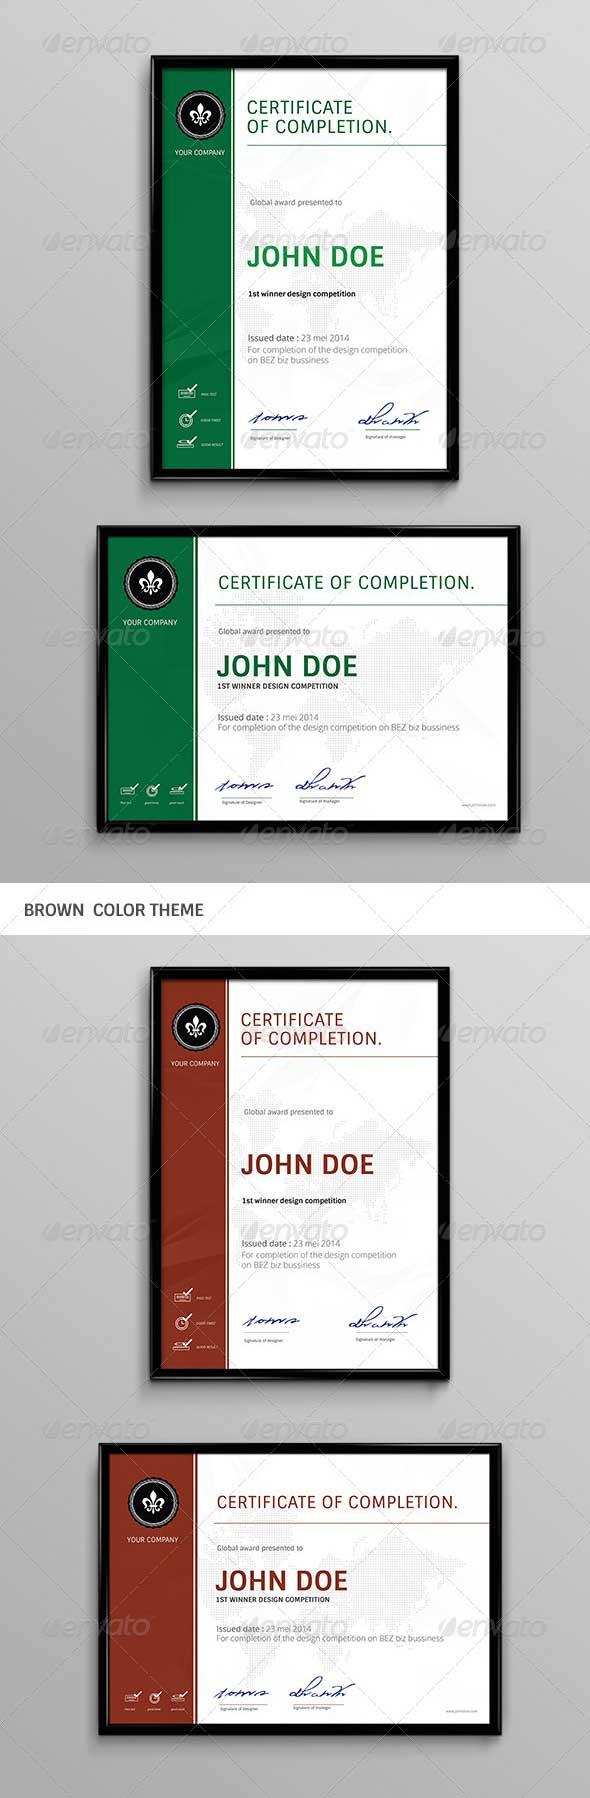 modern-multipurpose-certificate-templates